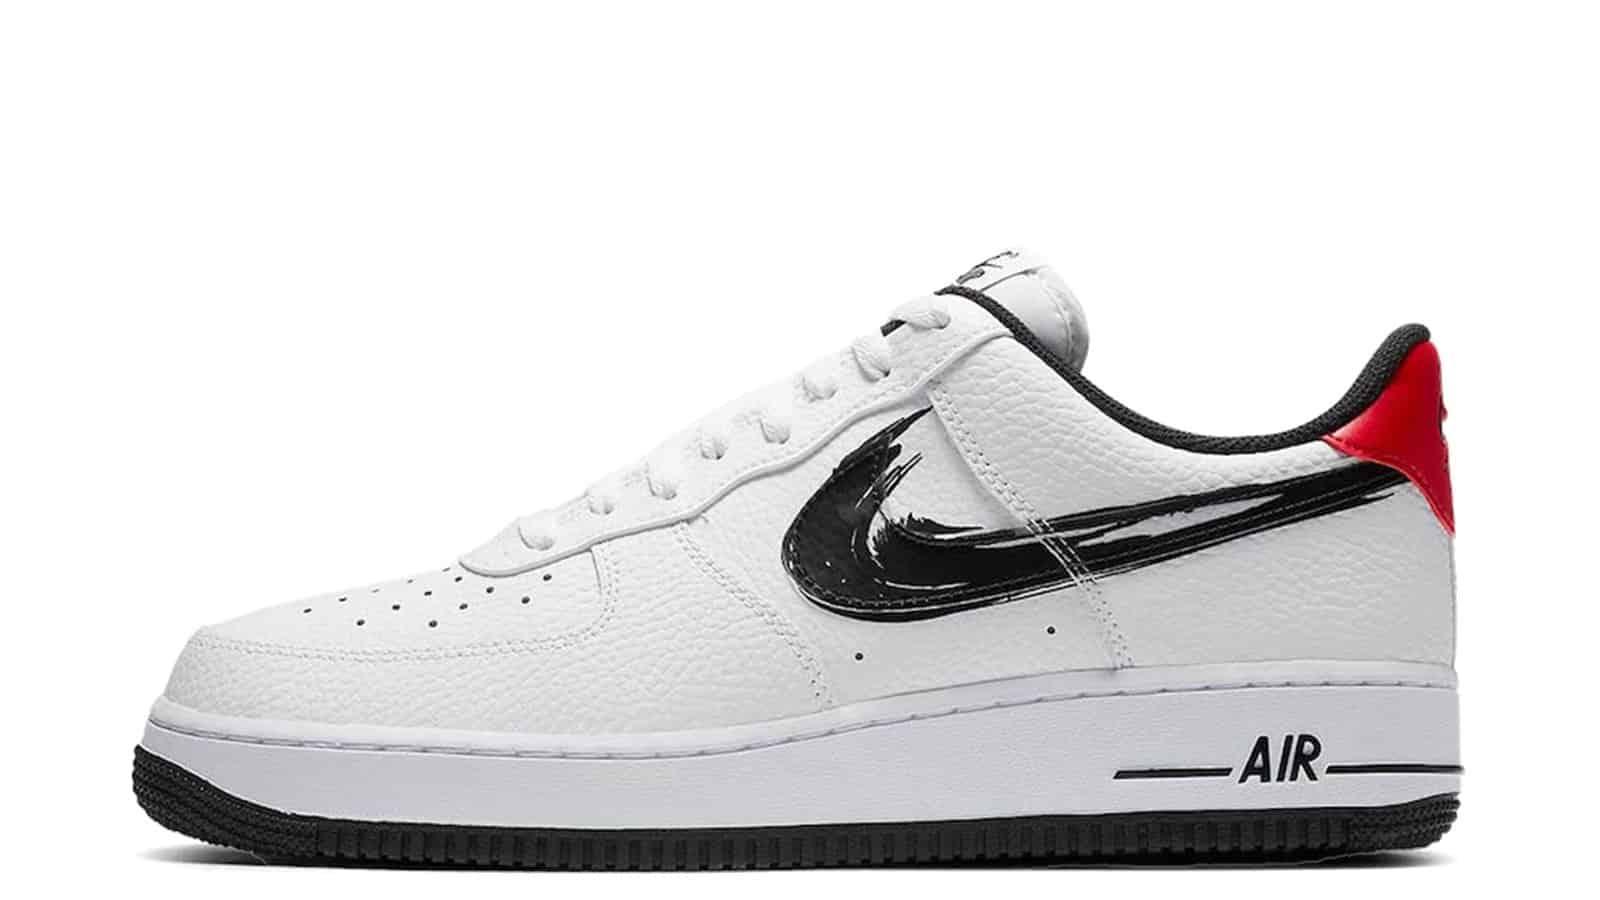 Nike Air Force 1 Low Brushstroke Swoosh White DA4657-100